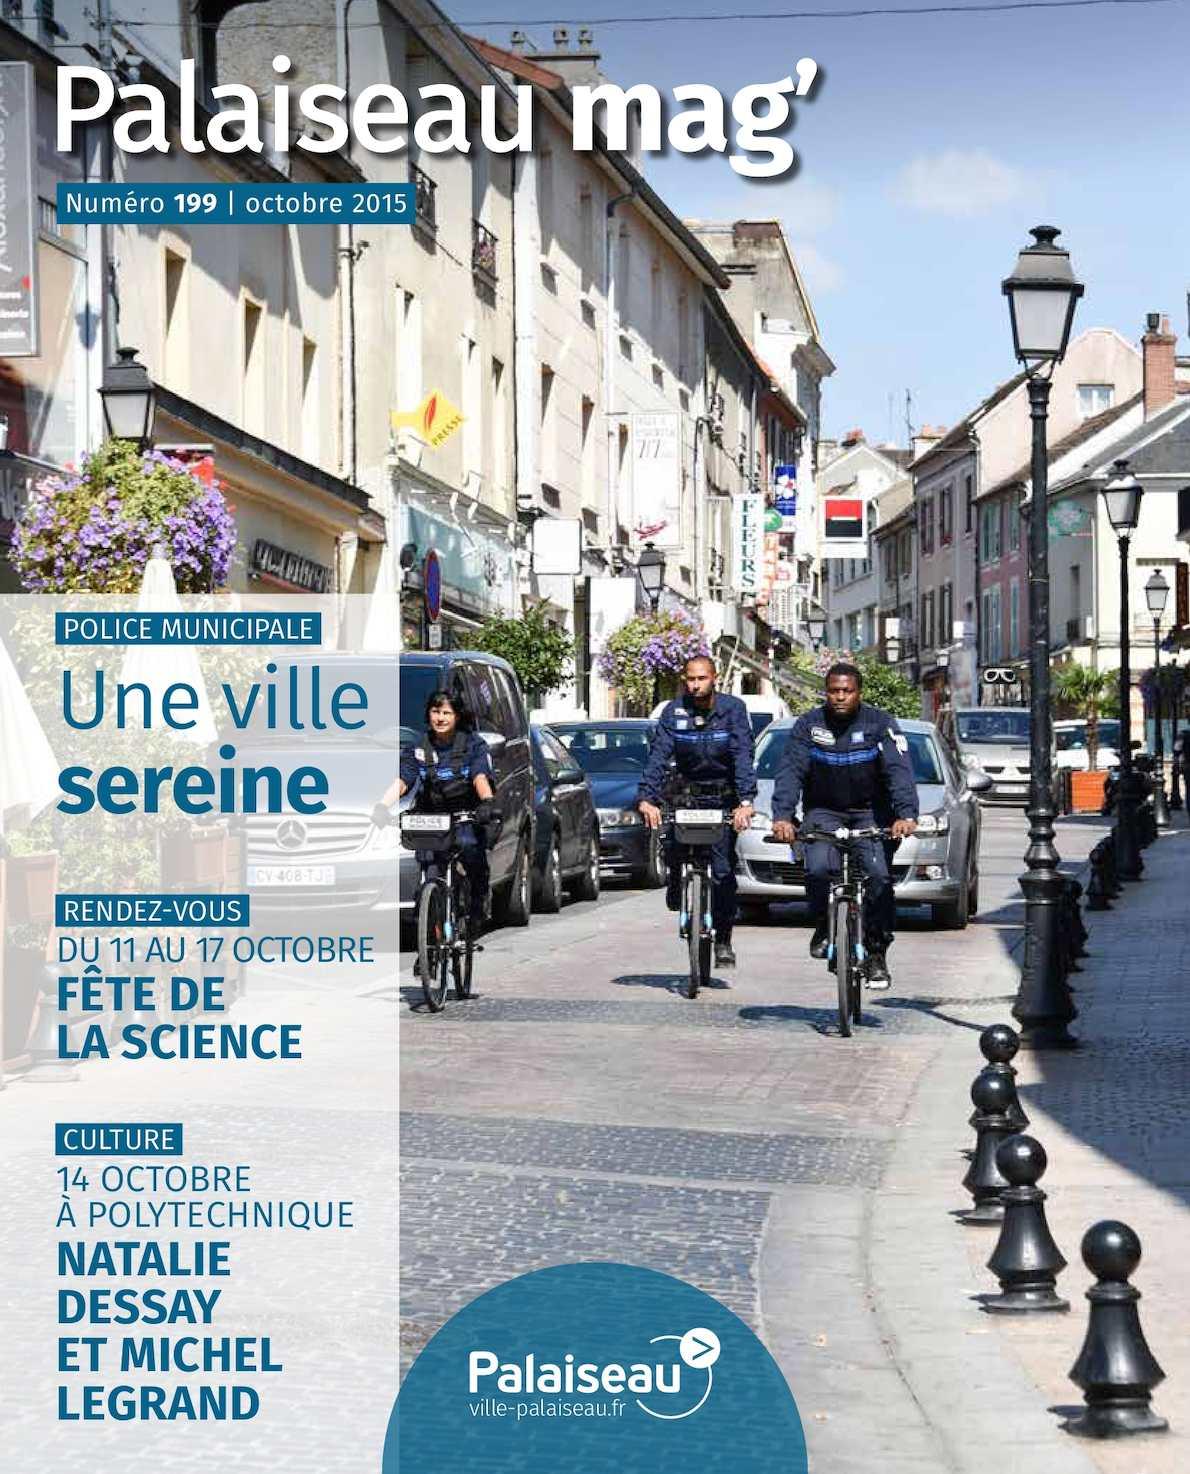 Calam o palaiseau mag n 199 octobre 2015 for Piscine de palaiseau